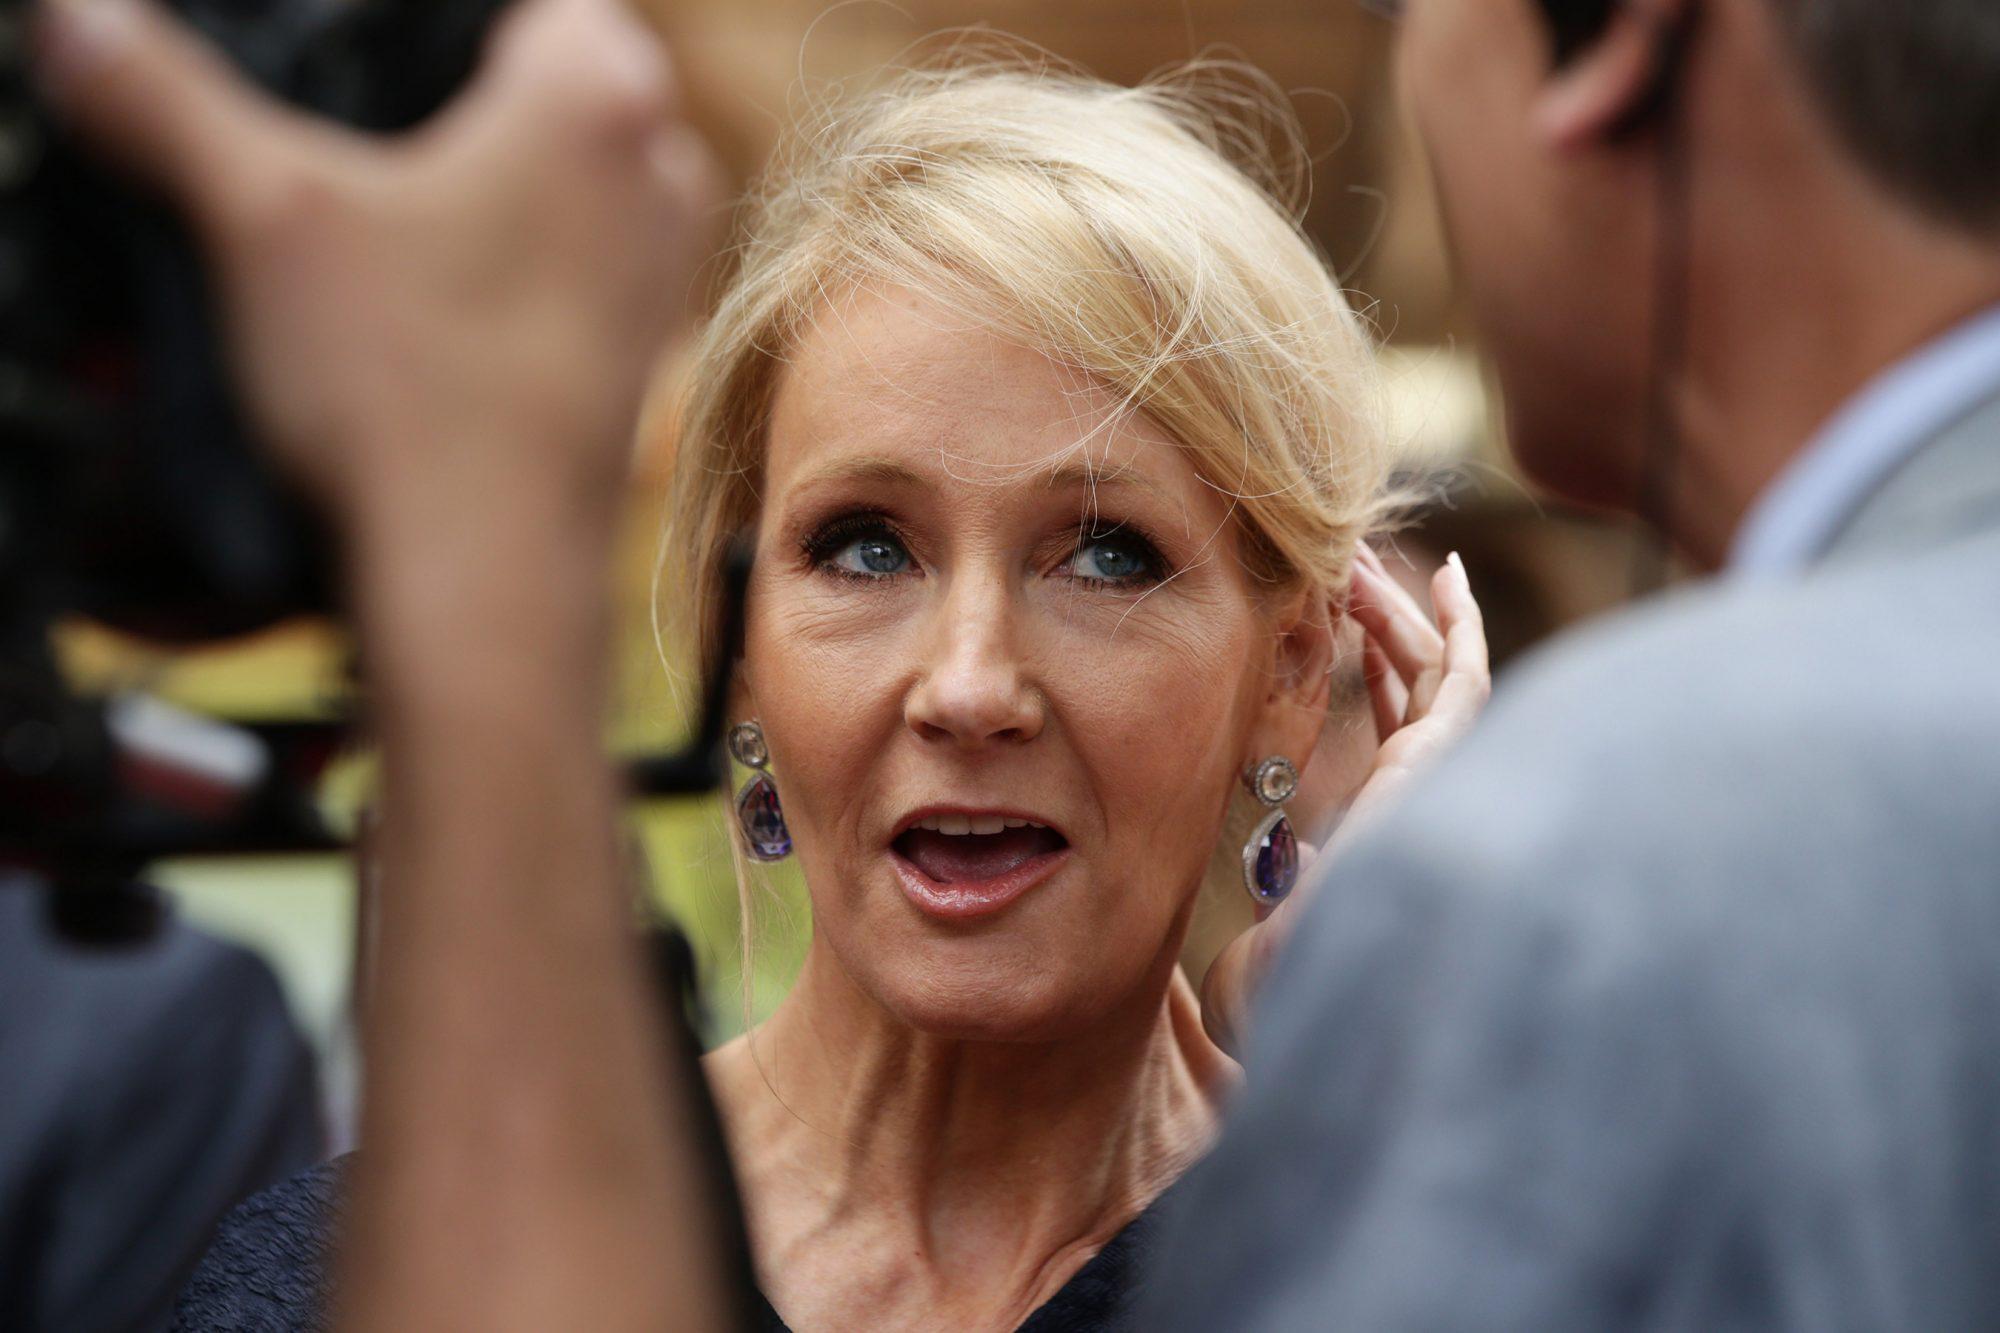 JK Rowling comments